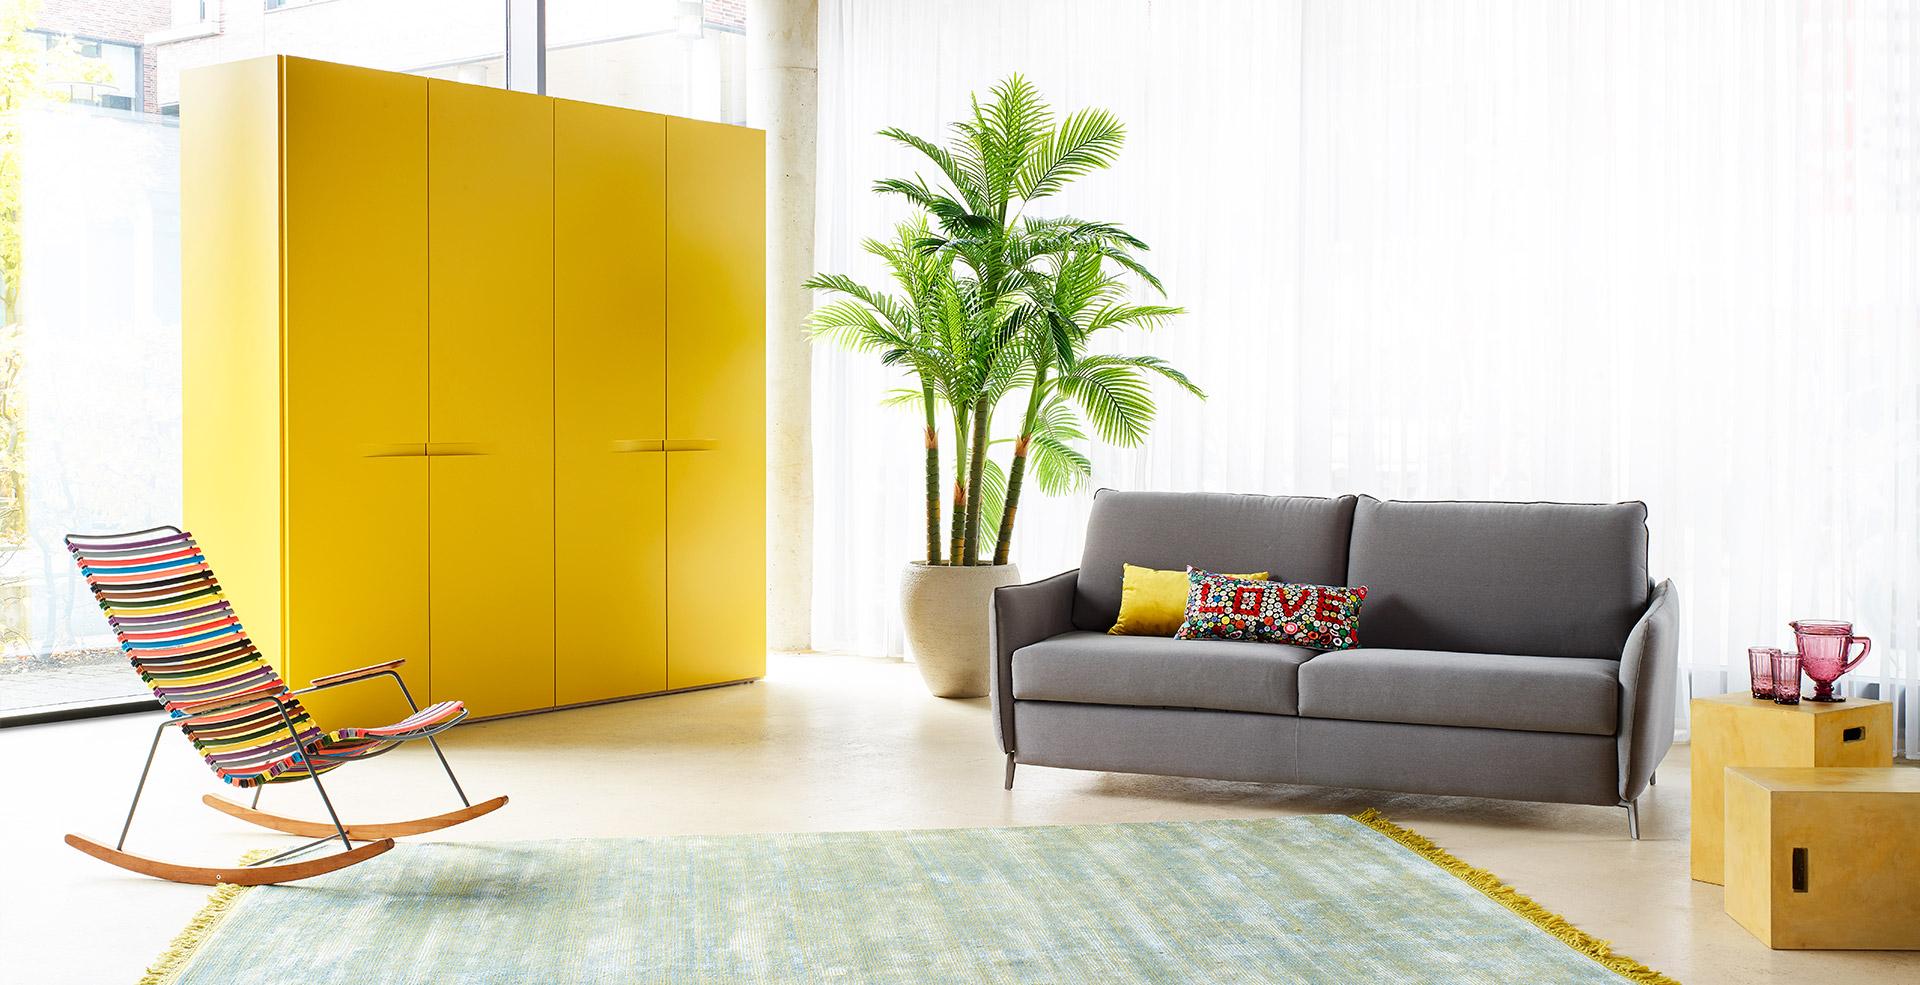 Mellow Yellow | KONTRAST - Möbel Leuchten Accessoires